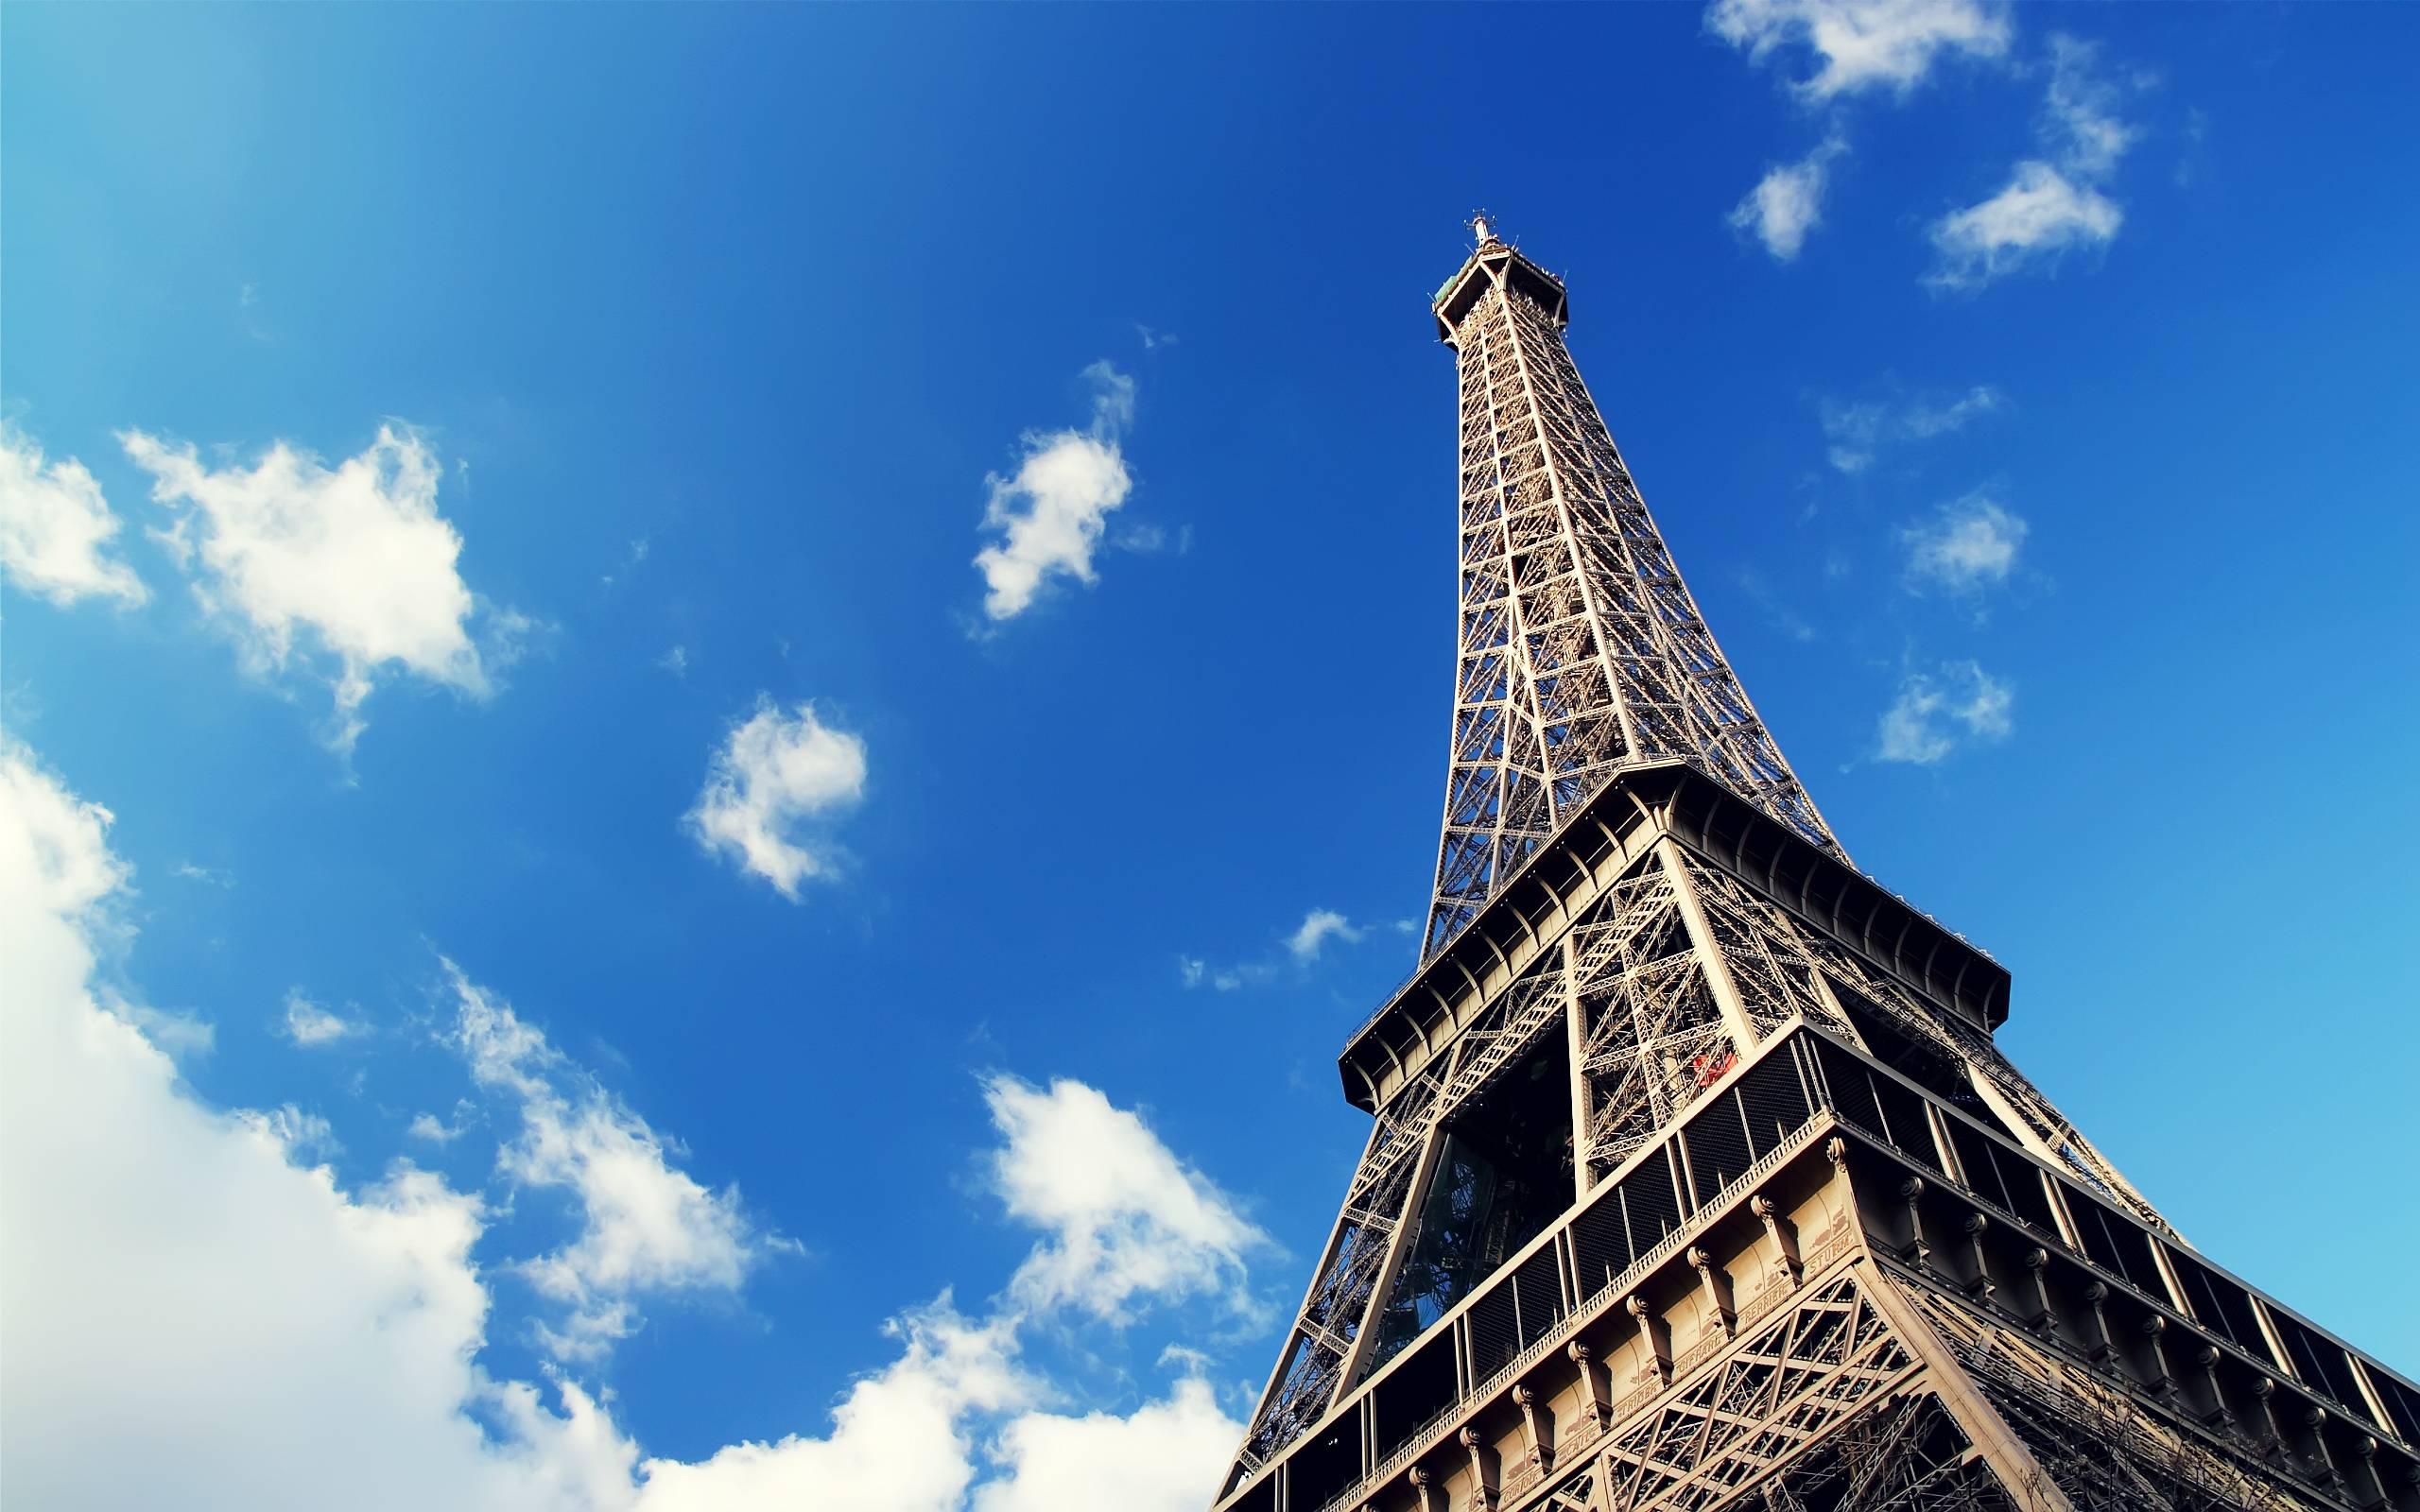 Hd wallpaper eiffel tower - Eiffel Tower Paris Wallpapers Hd Wallpapers